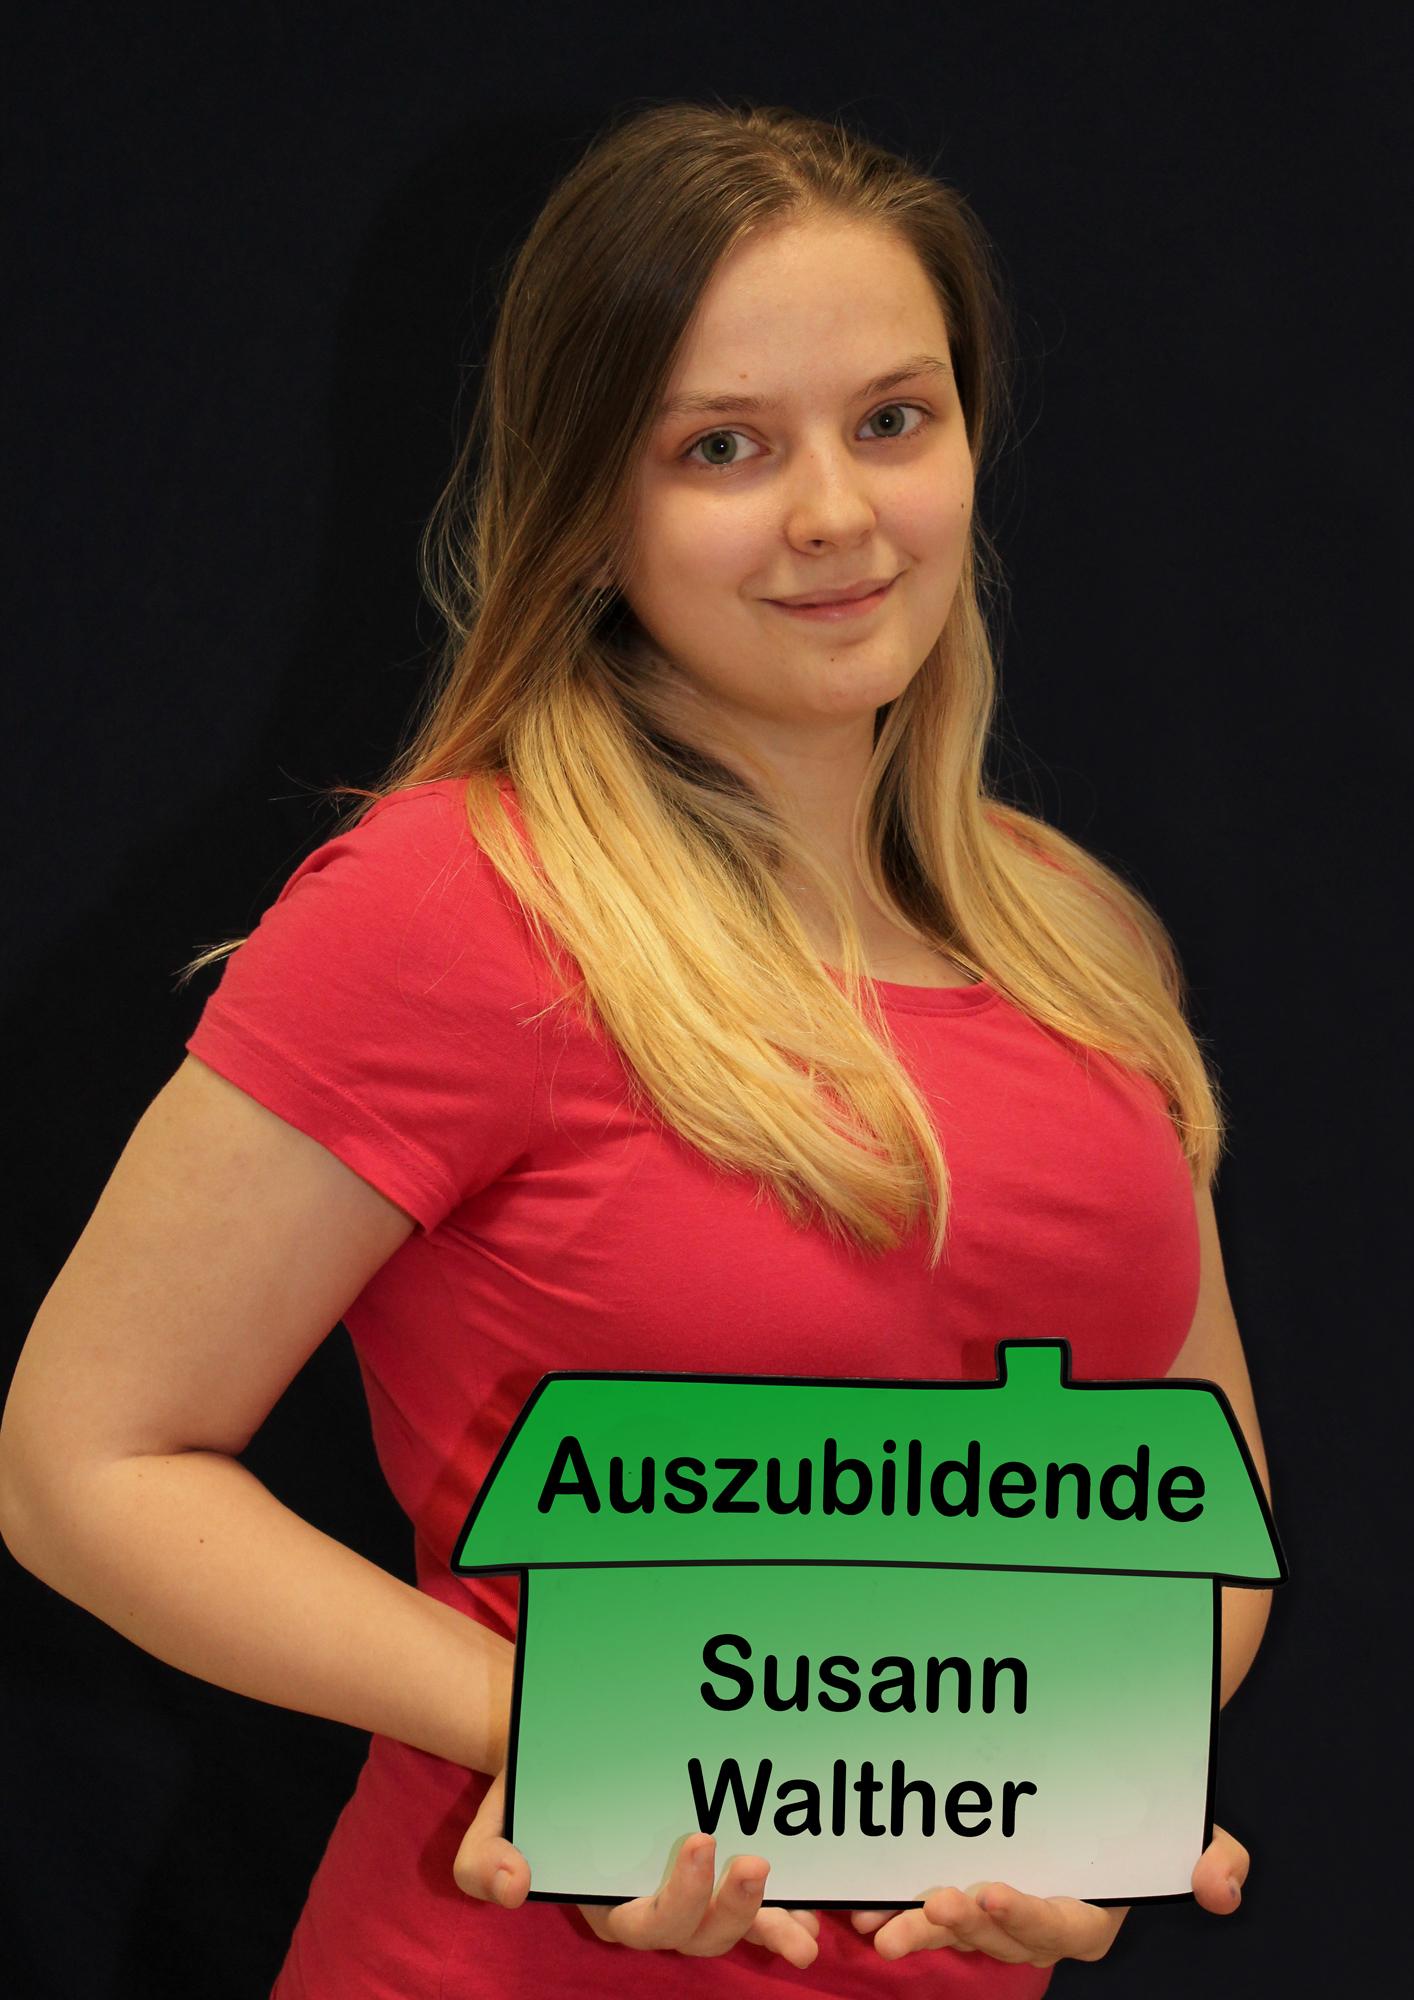 Susann Walther